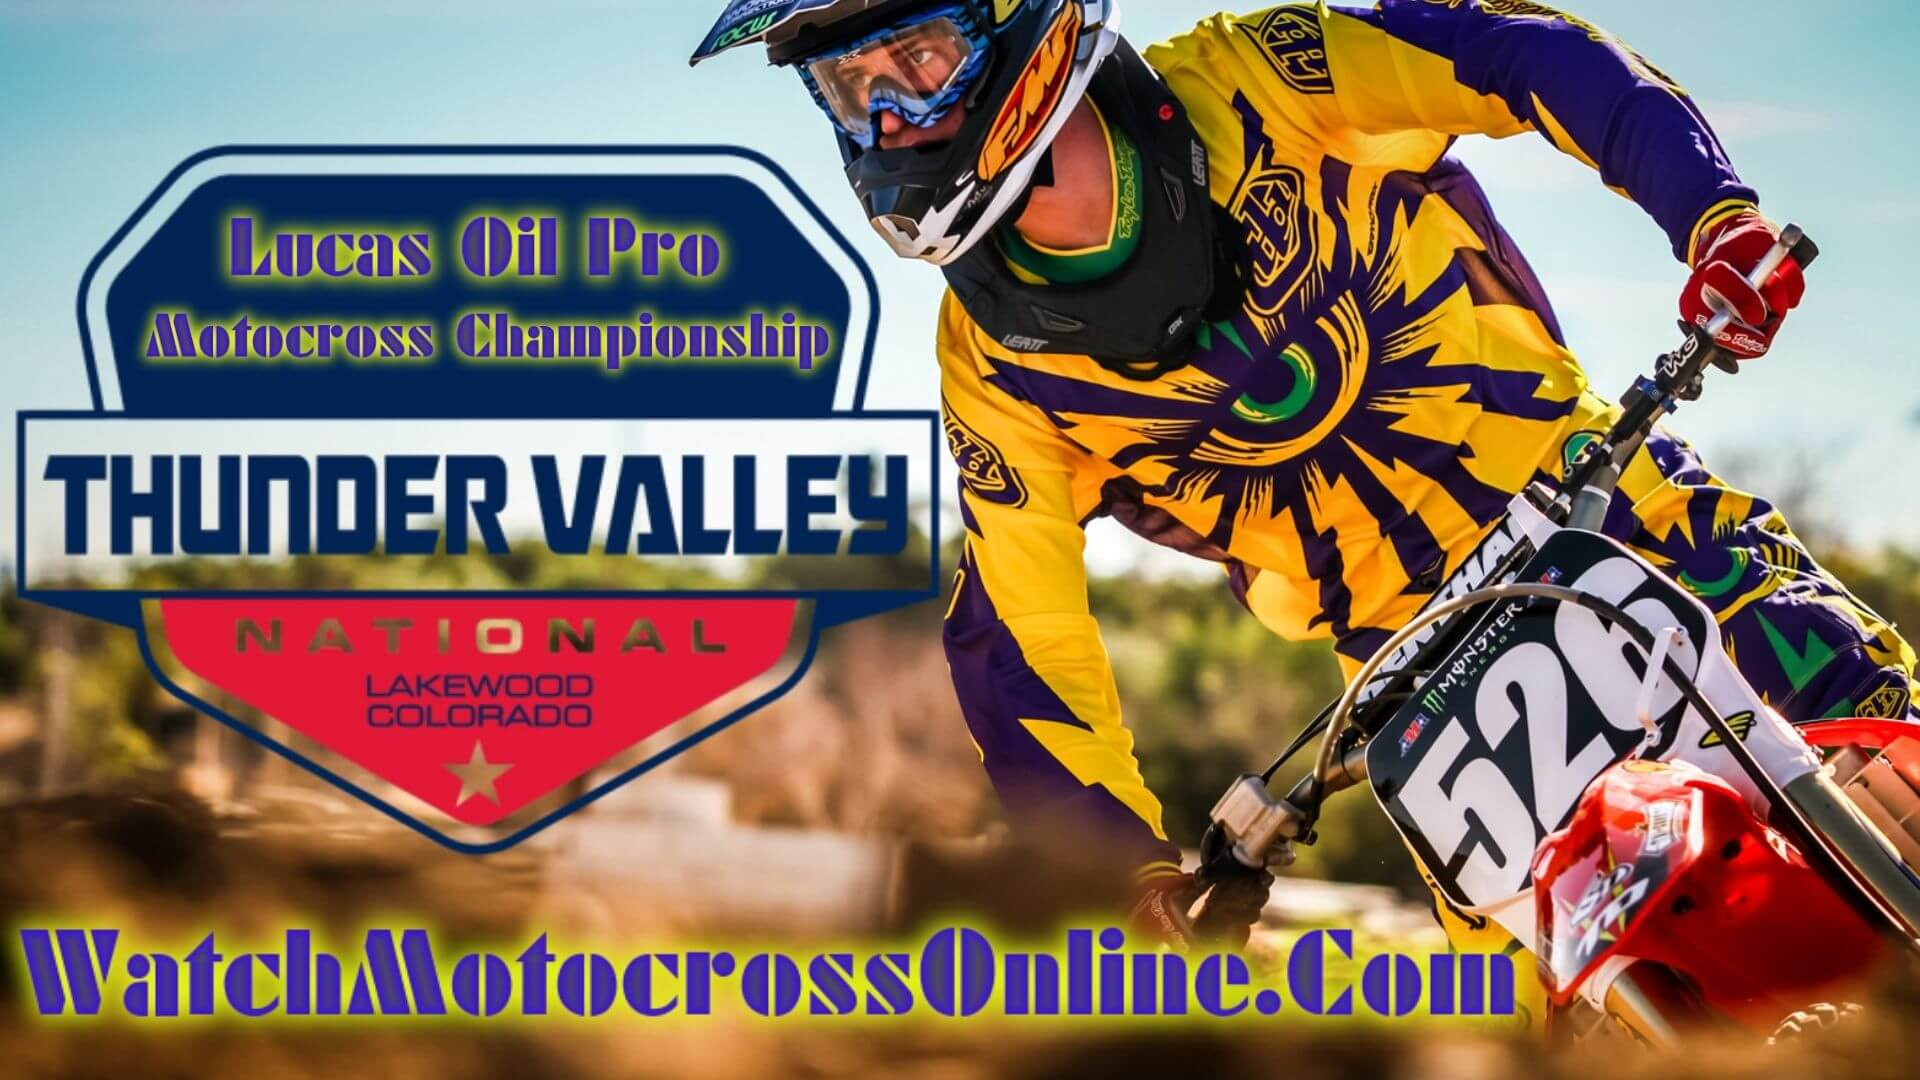 Thunder Valley : Pro Motocross Live Stream - 2020 - Video On Demand